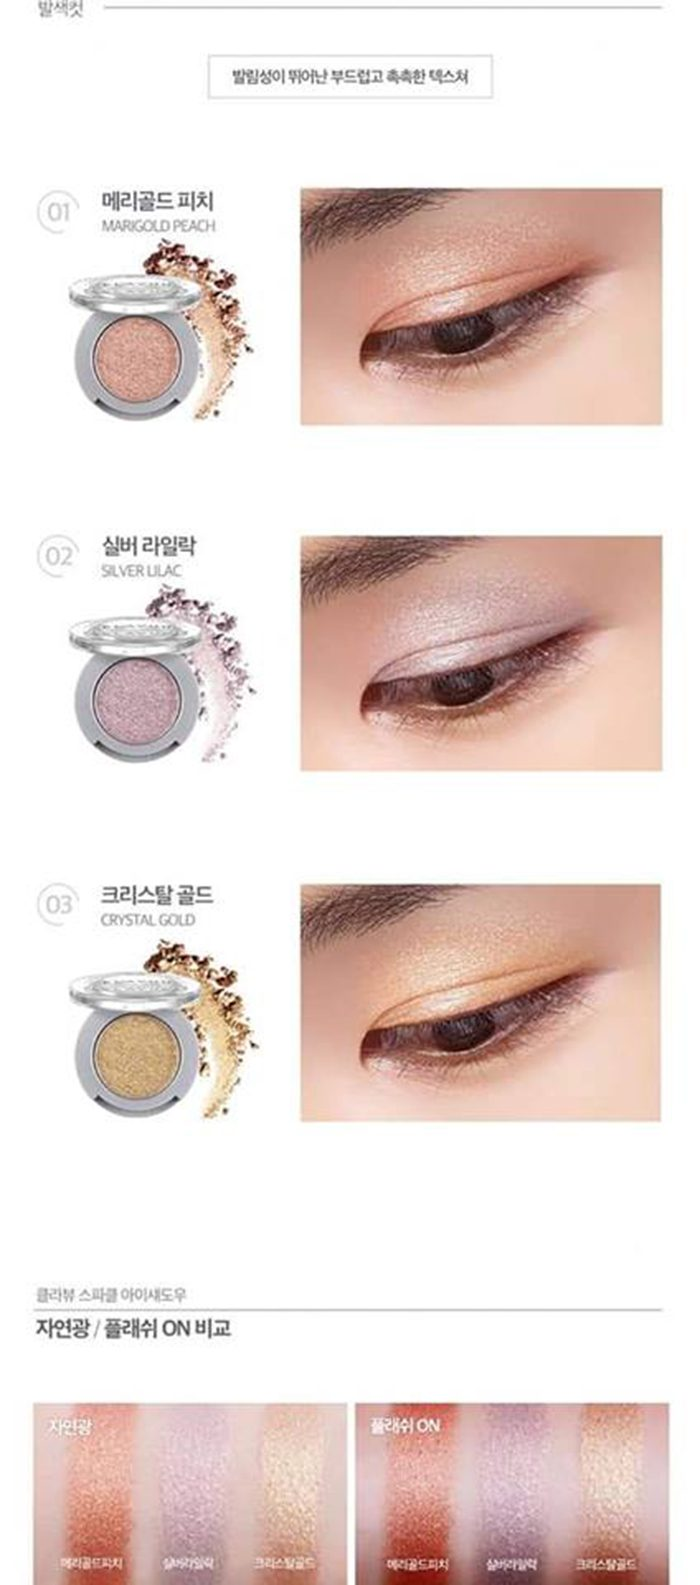 Nhũ mắt Klavuu Urban Pearlsation Sparkle Eyeshadow